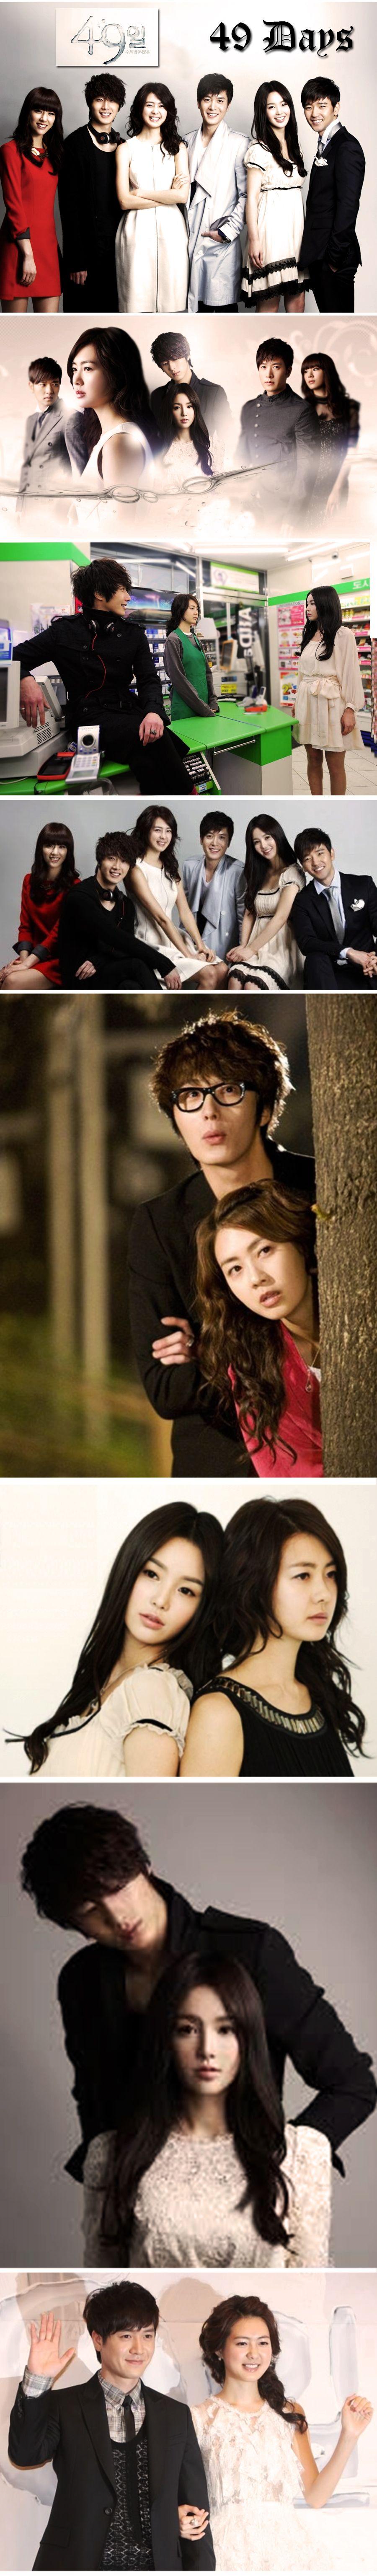 Nam gyuri and jo hyun jae dating website